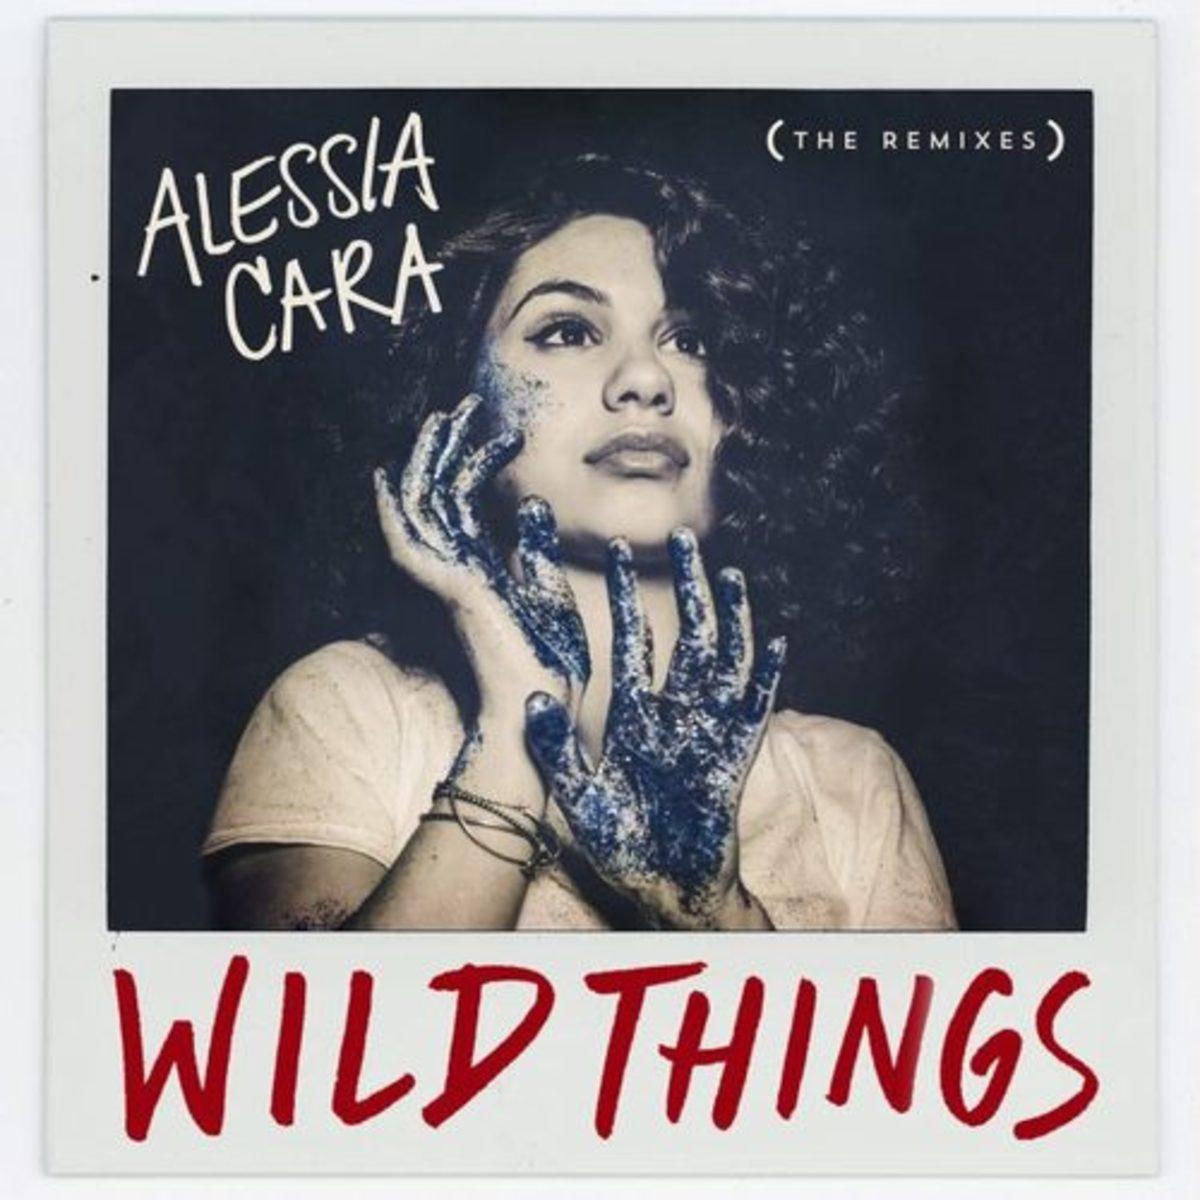 alessia-cara-wild-things-remix.jpg